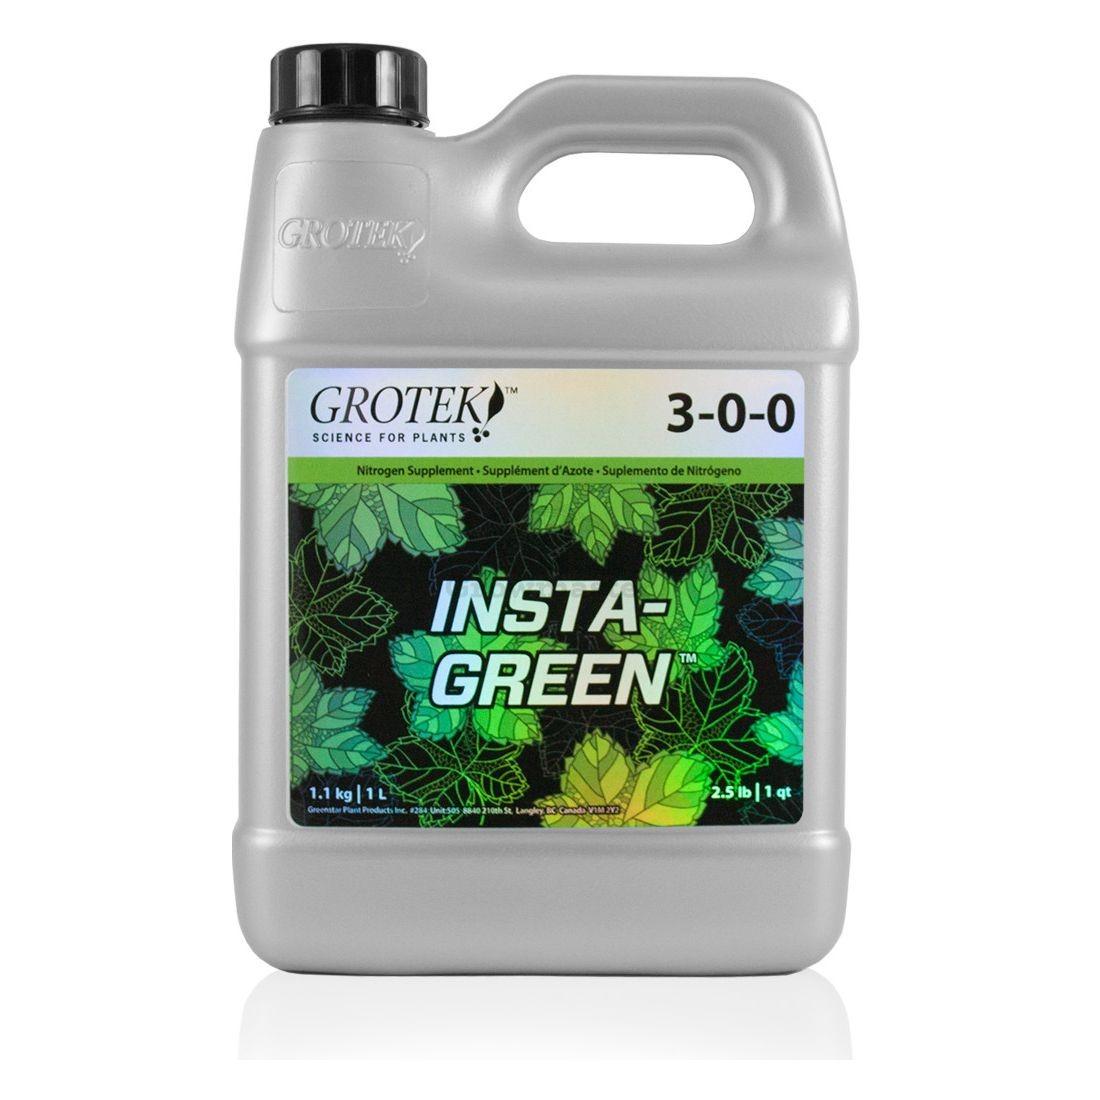 Grotek Insta-Green 1 l